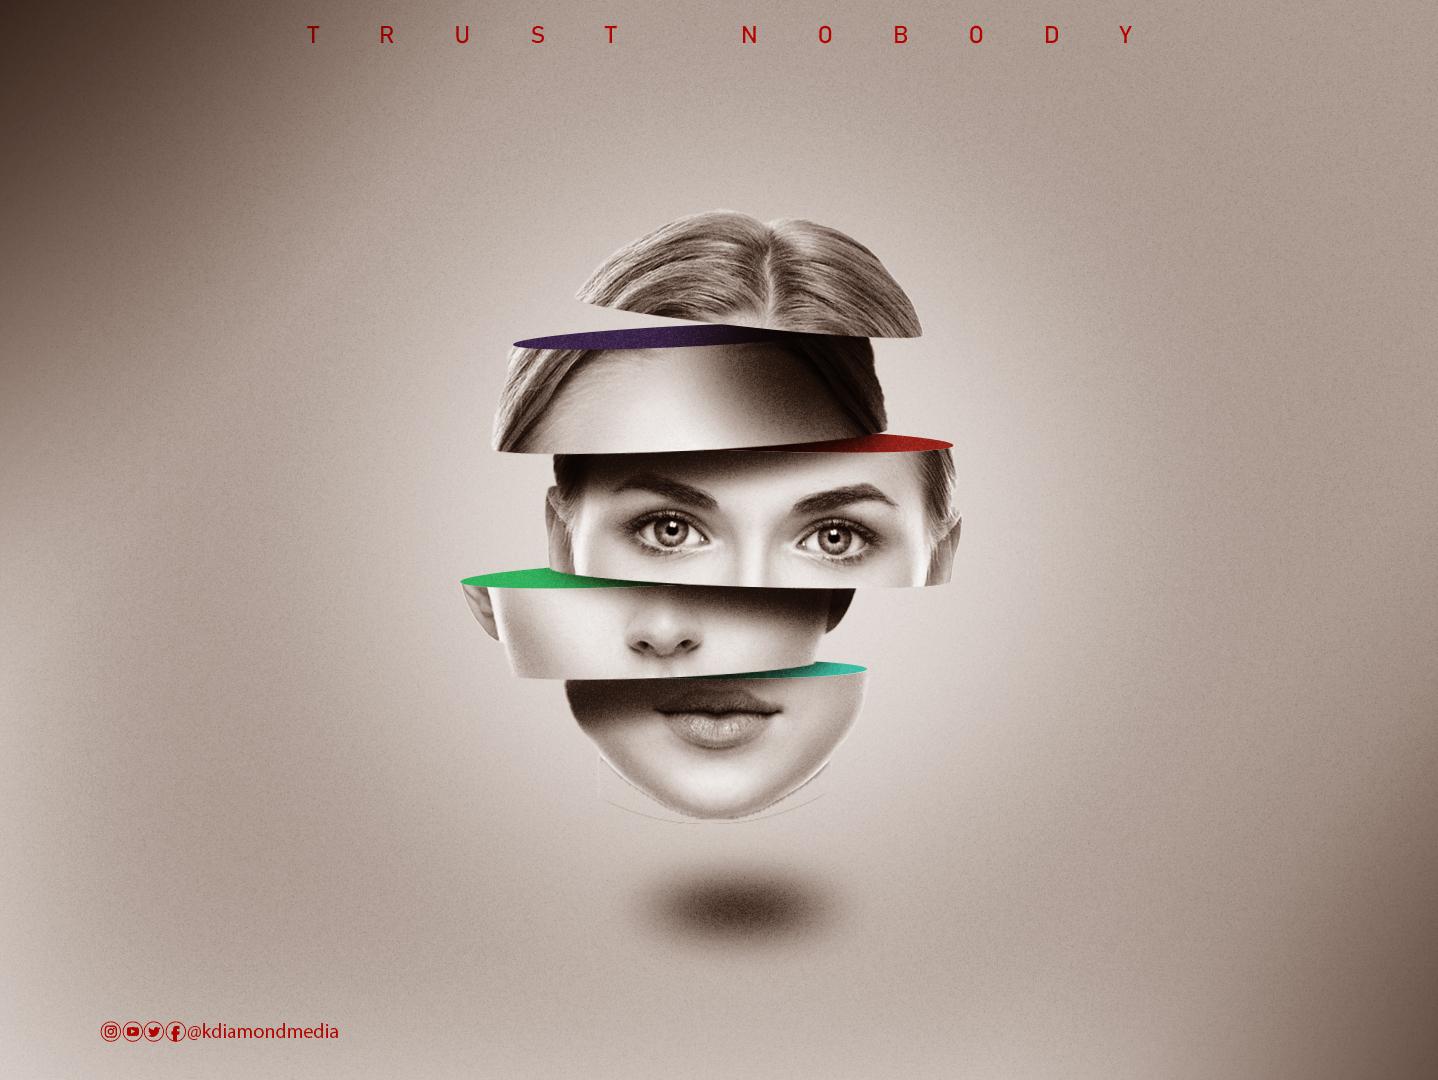 Woman Face Portrait @design @kdiamondmedia @ameachimathias